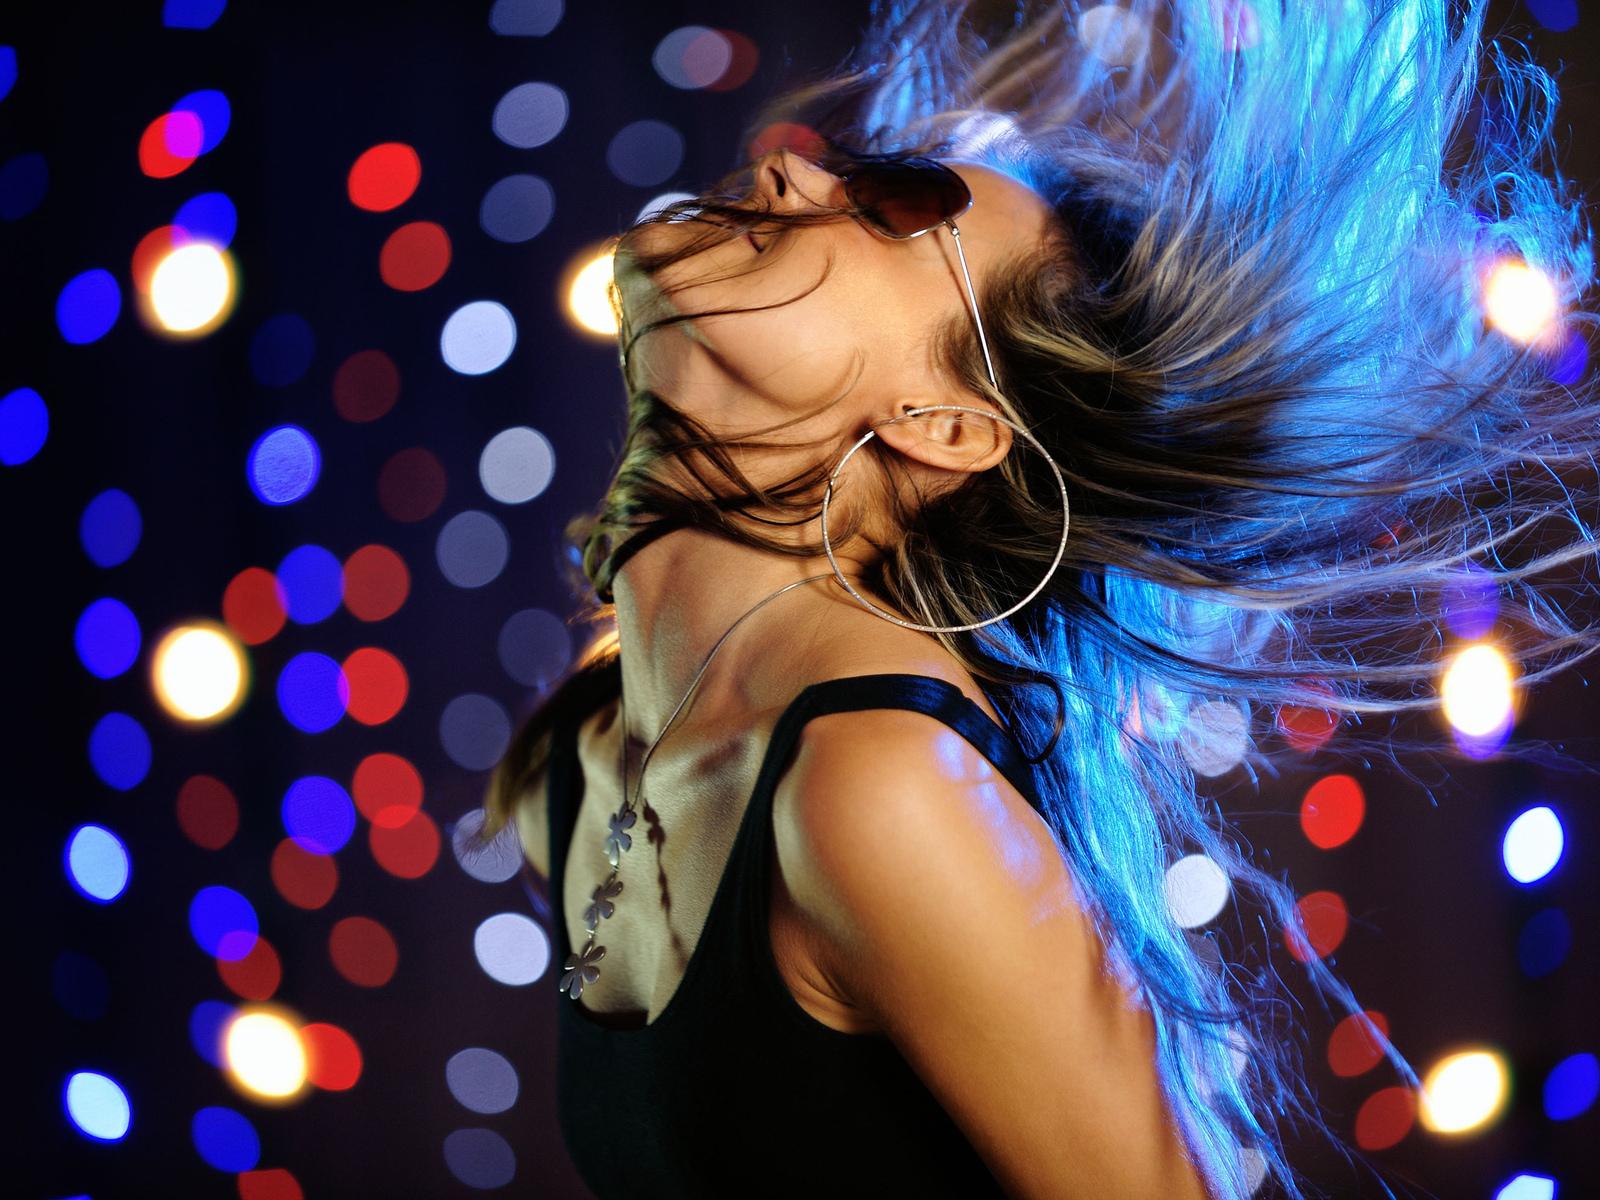 Сайт где девушки танцуют онлайн 18 фотография